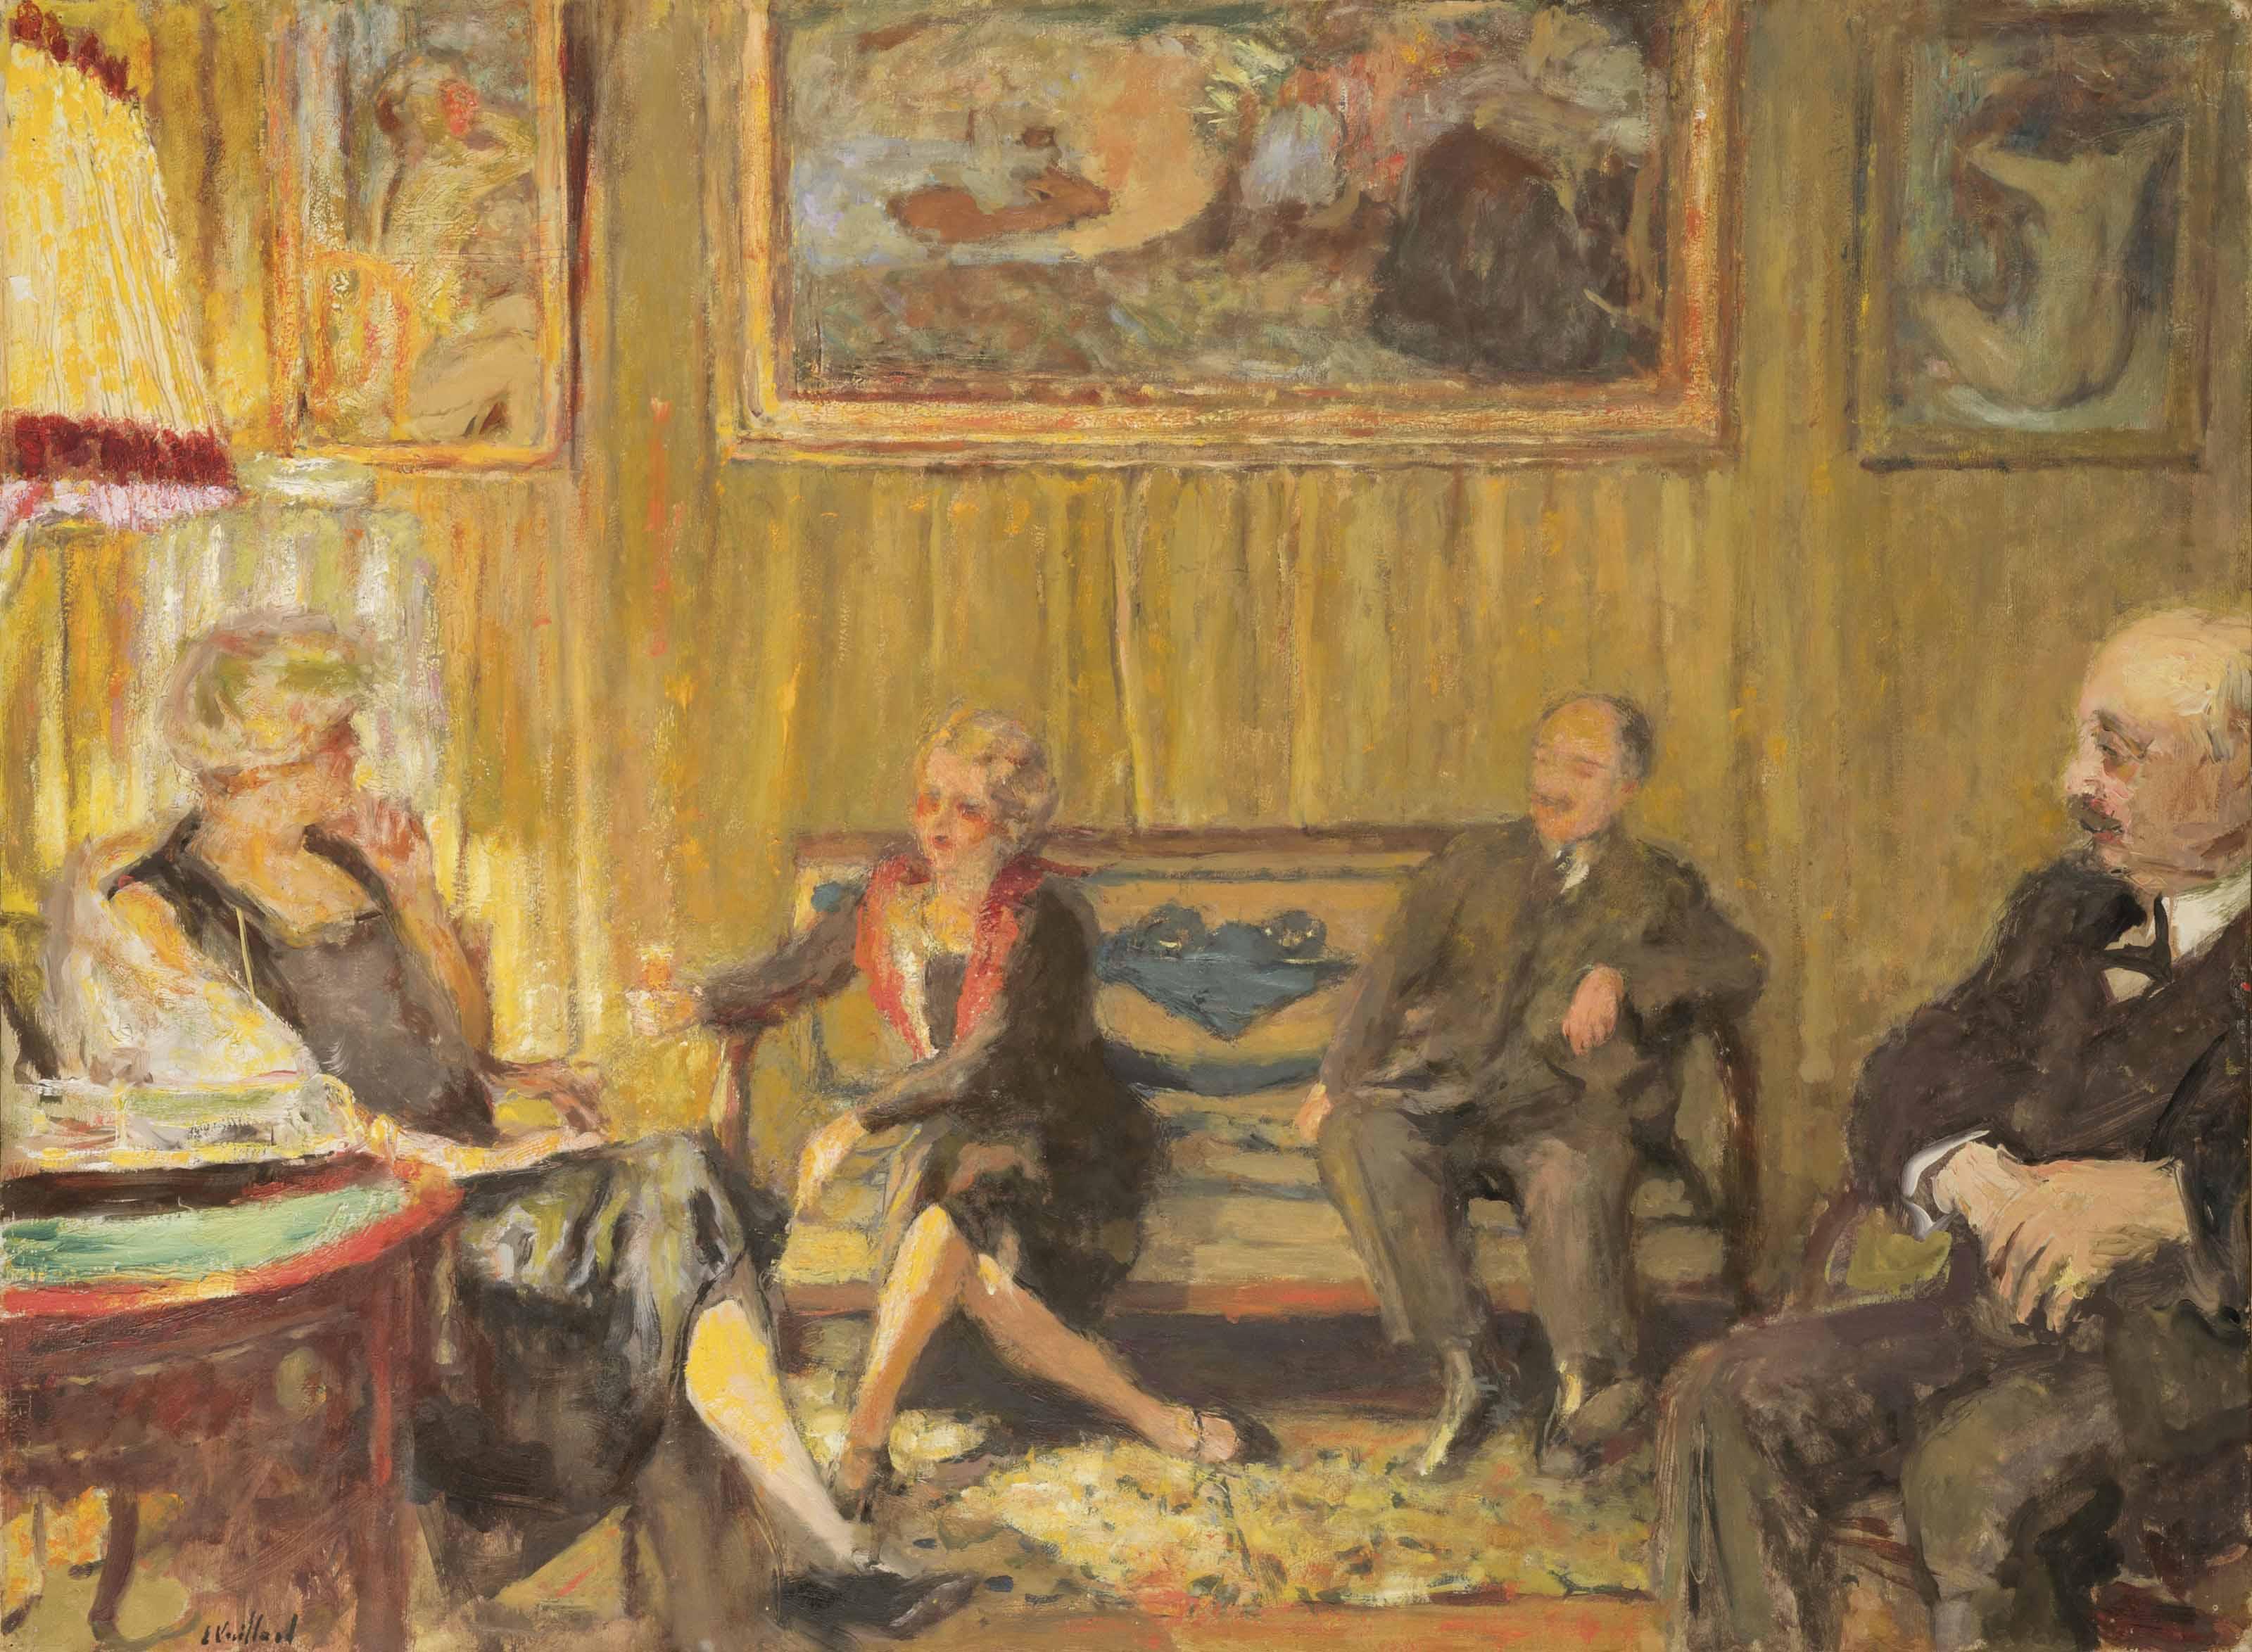 Douard vuillard 1868 1940 le petit salon rue de for Le petit salon de jimmy